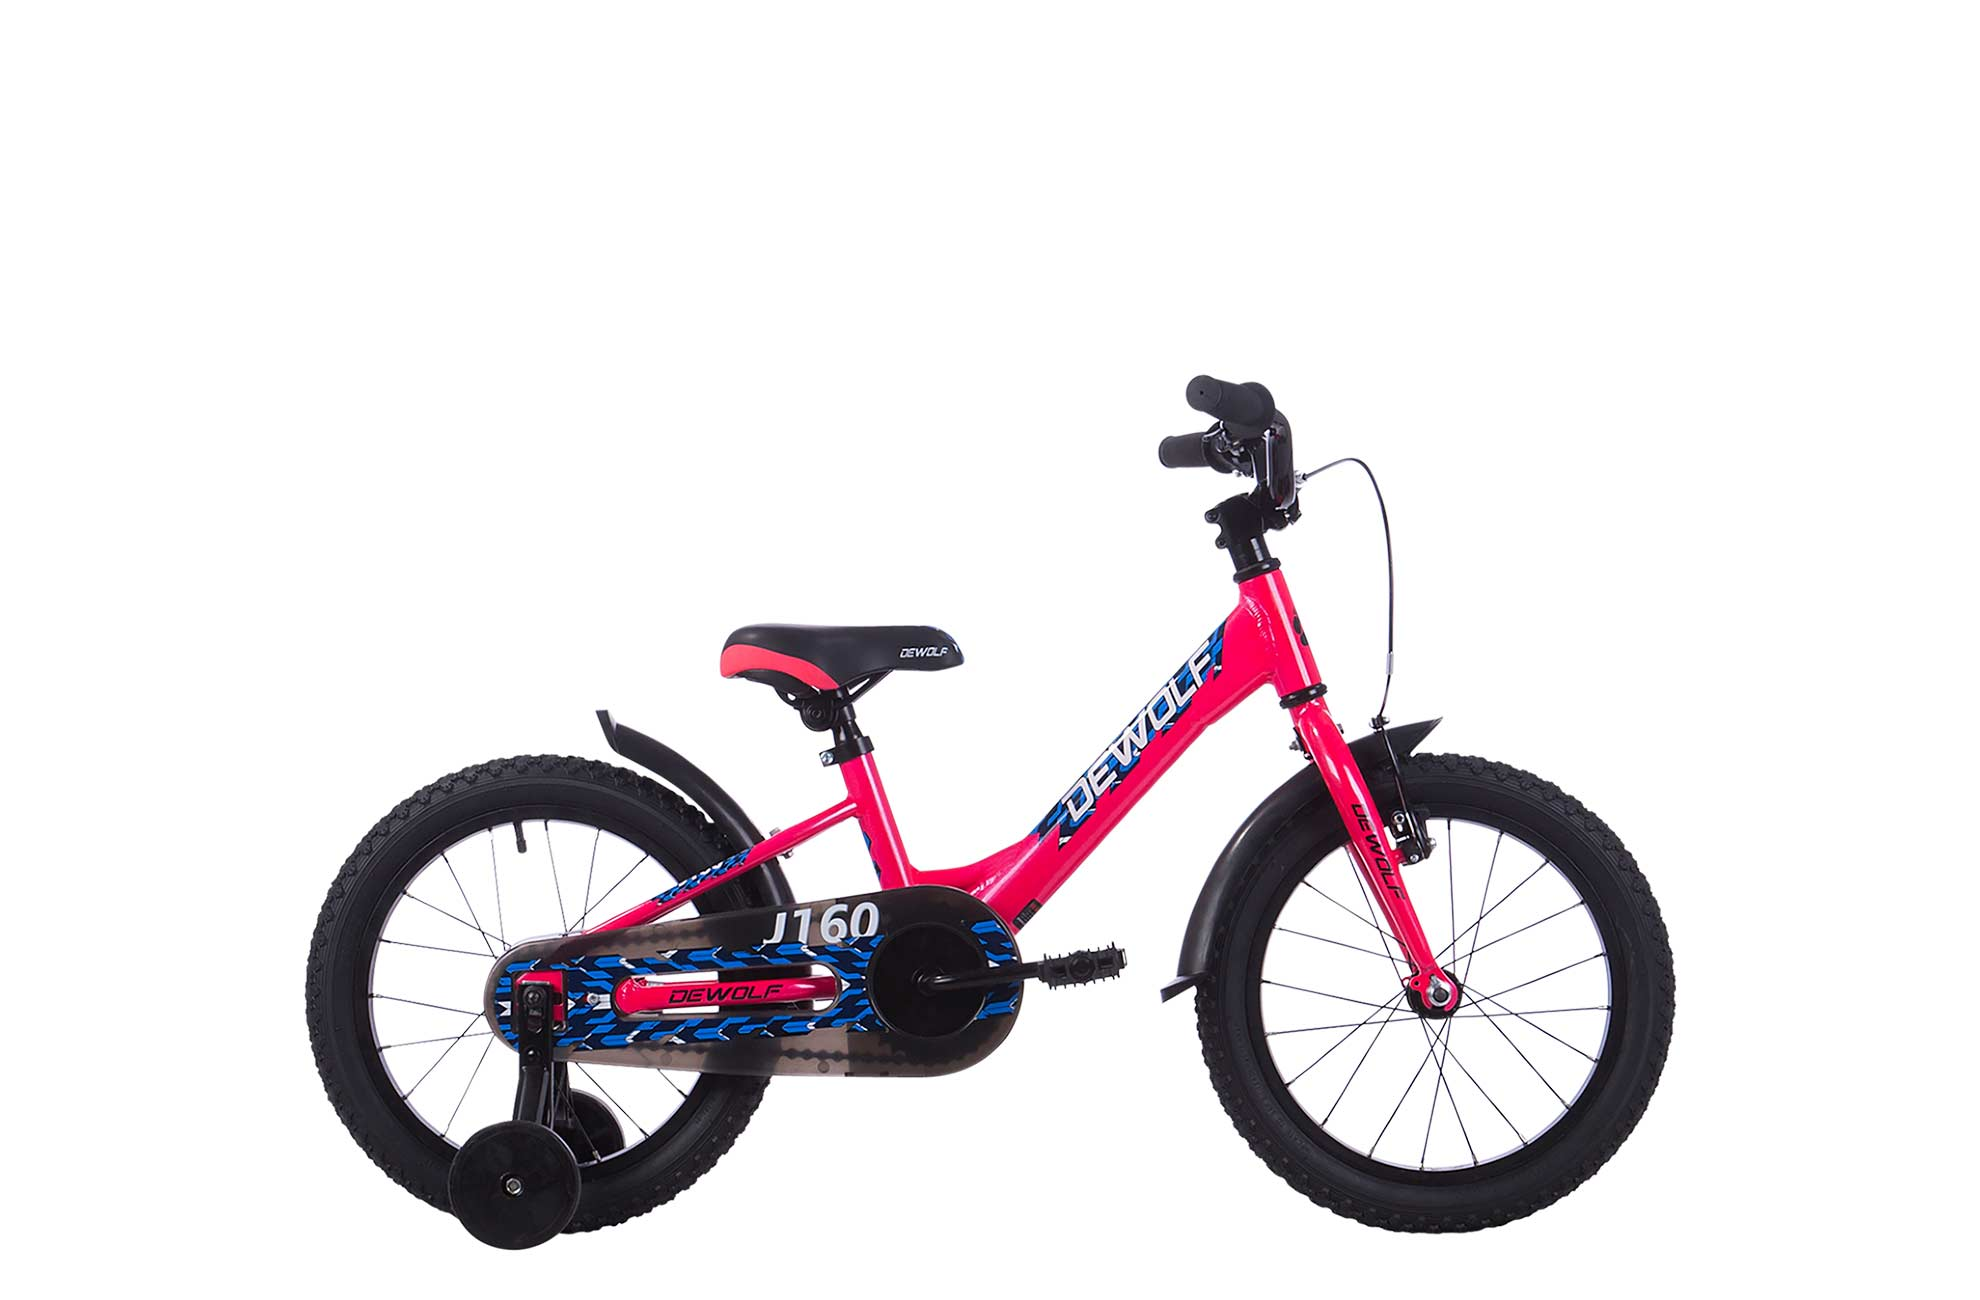 Детский велосипед DEWOLF J160 GIRL (2016) от Velogrand